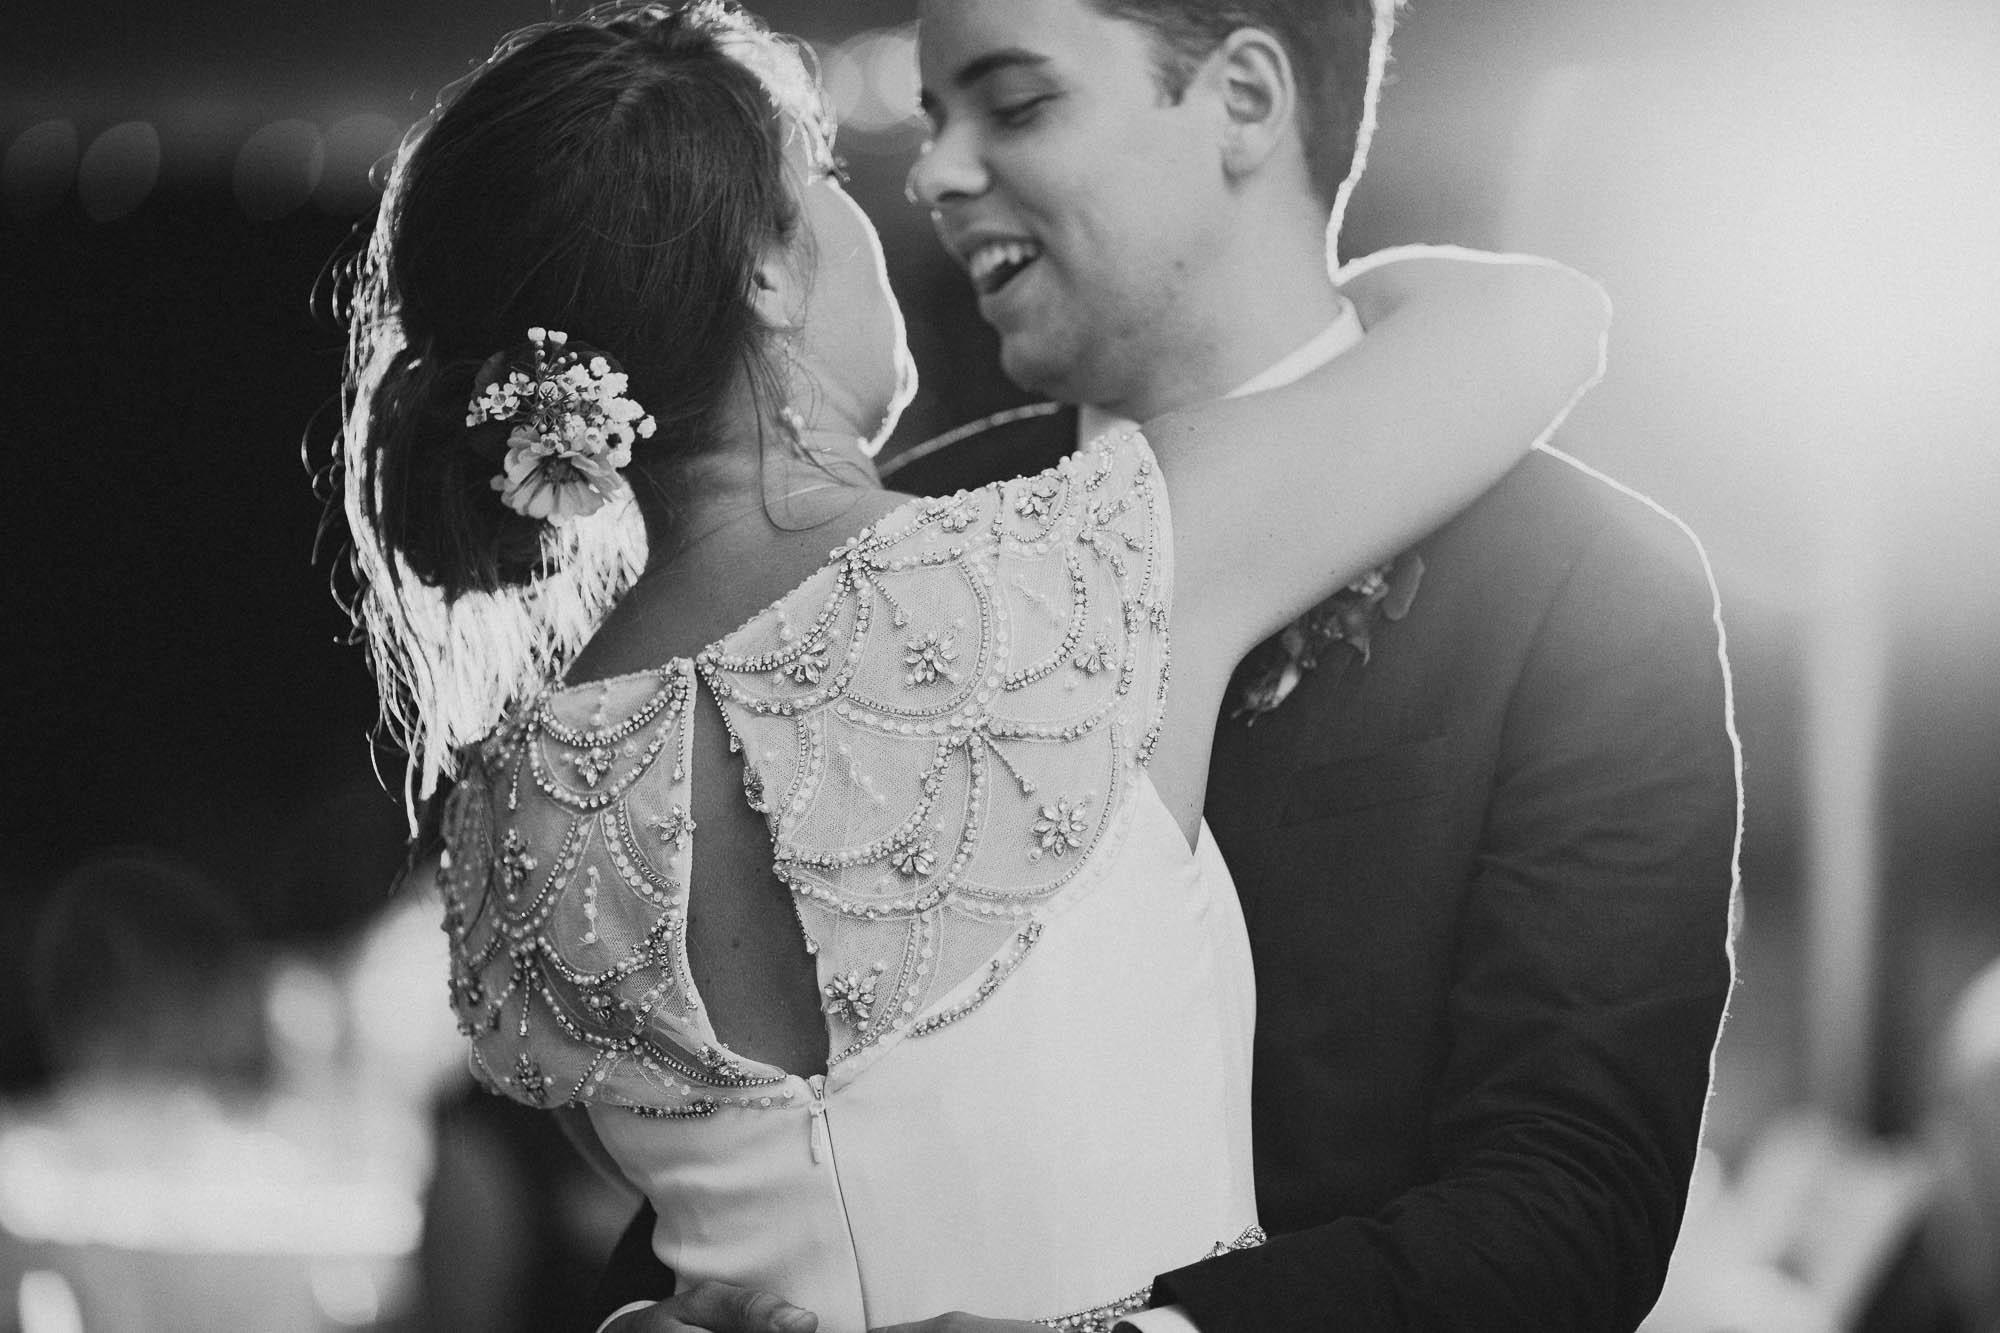 Leah-Graham-Michigan-Outdoor-DIY-Wedding-068@2x.jpg